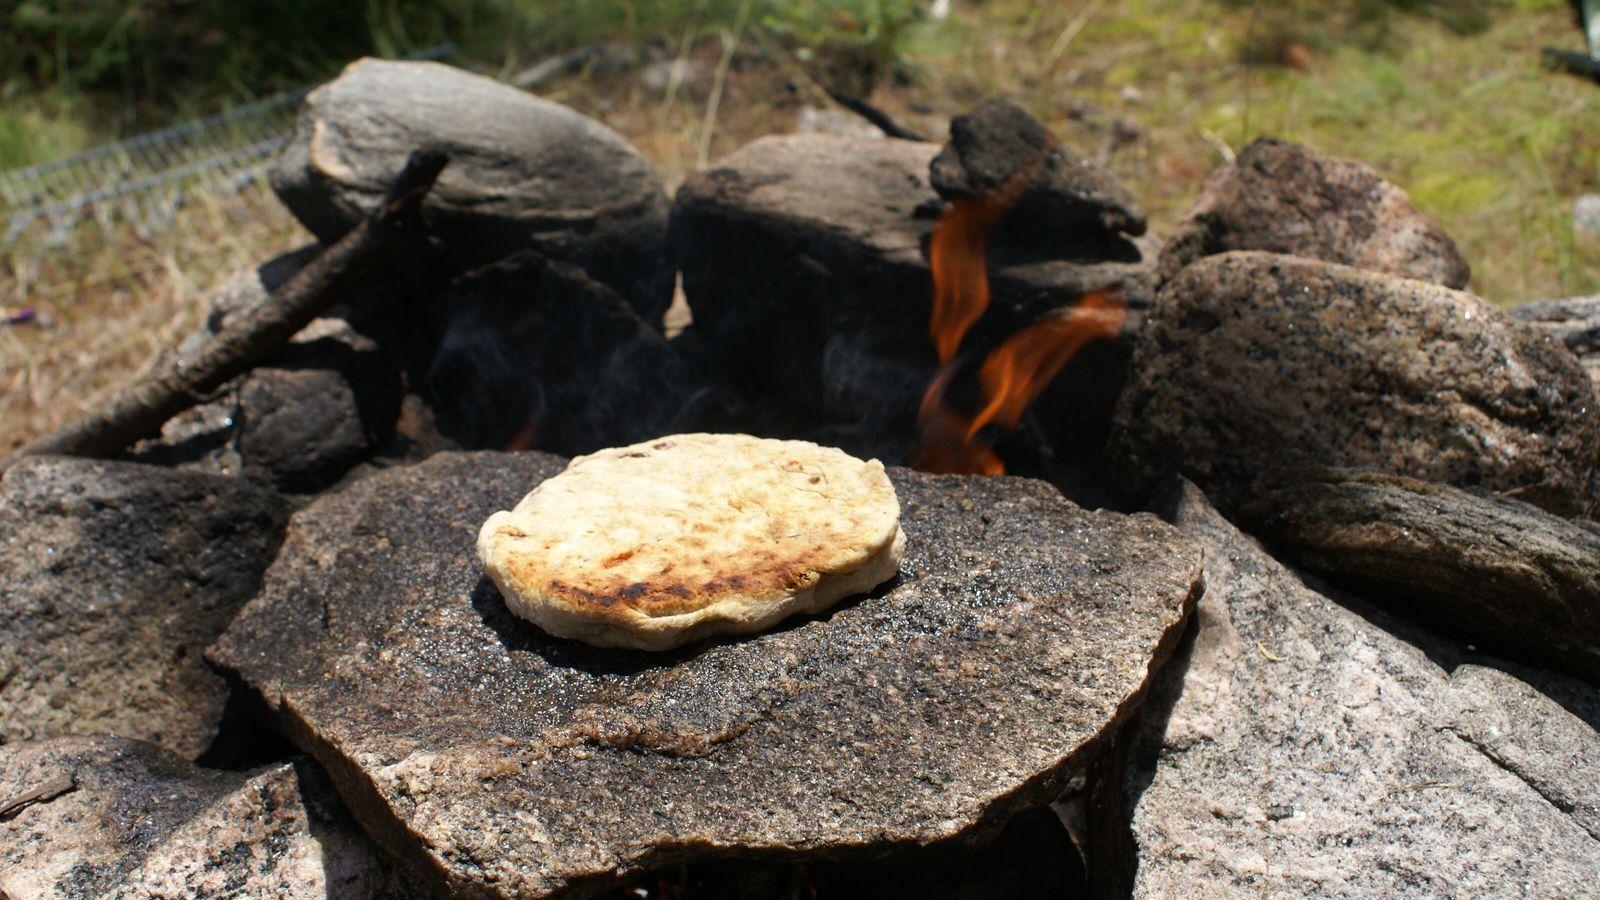 Bannock bread baked on a hot rock over a campfire.